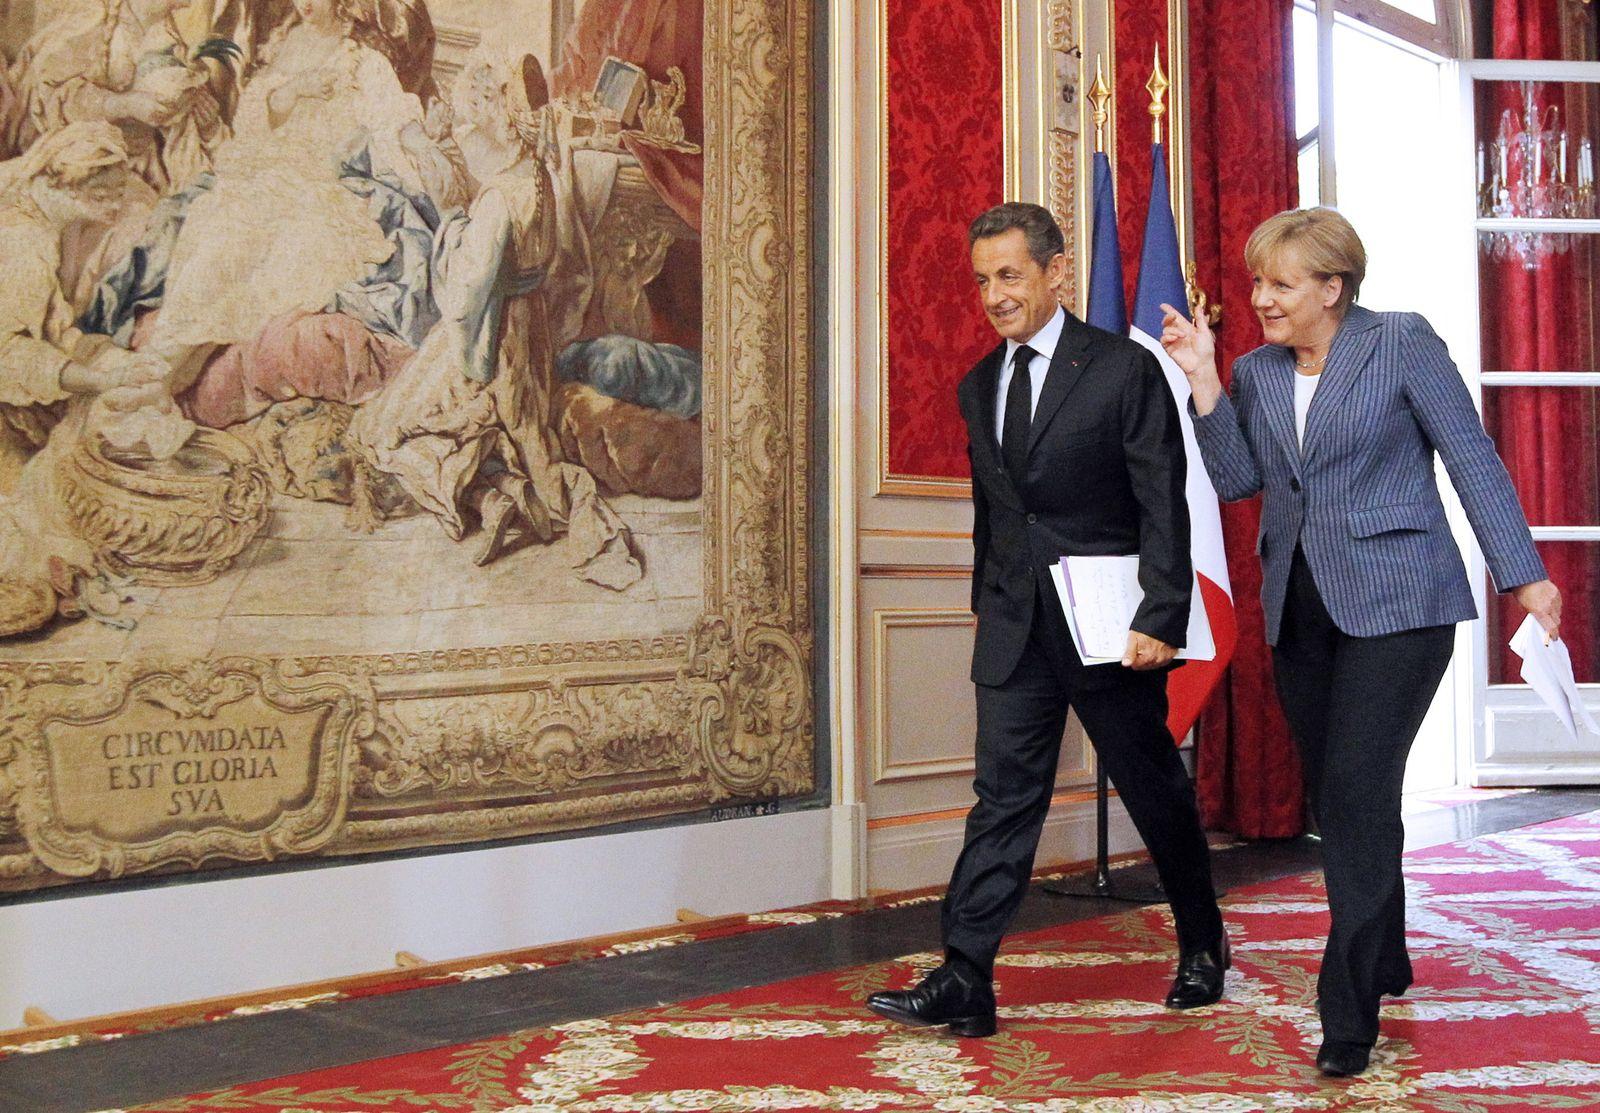 Merkel, Sarkozy call for new eurozone budget rules